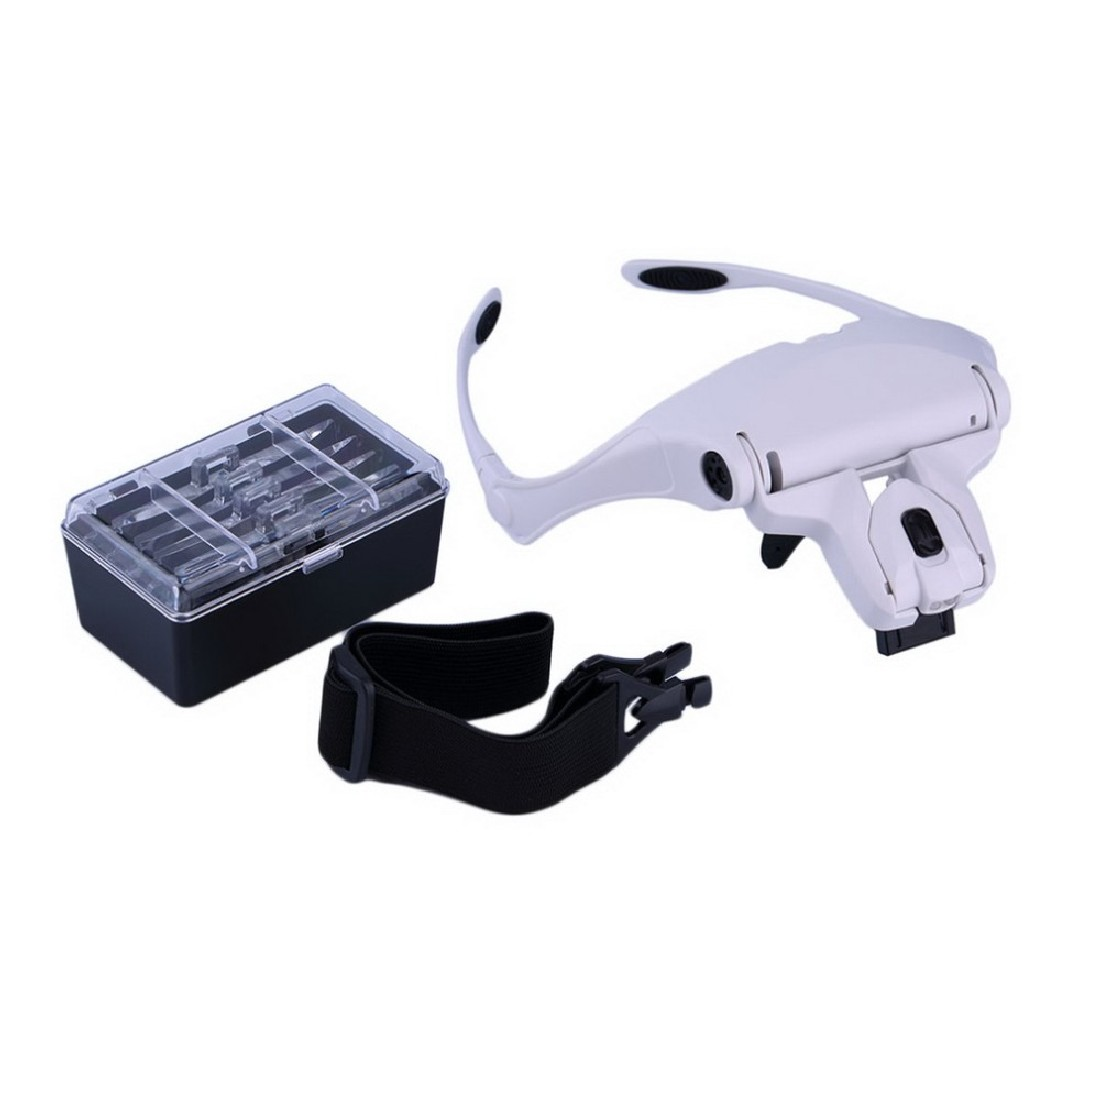 Kreative 1,0X1,5X2,0X2,5X3,5X5 Objektiv Einstellbar Lupe Stirnband Lupe Lupe mit LED Lupen